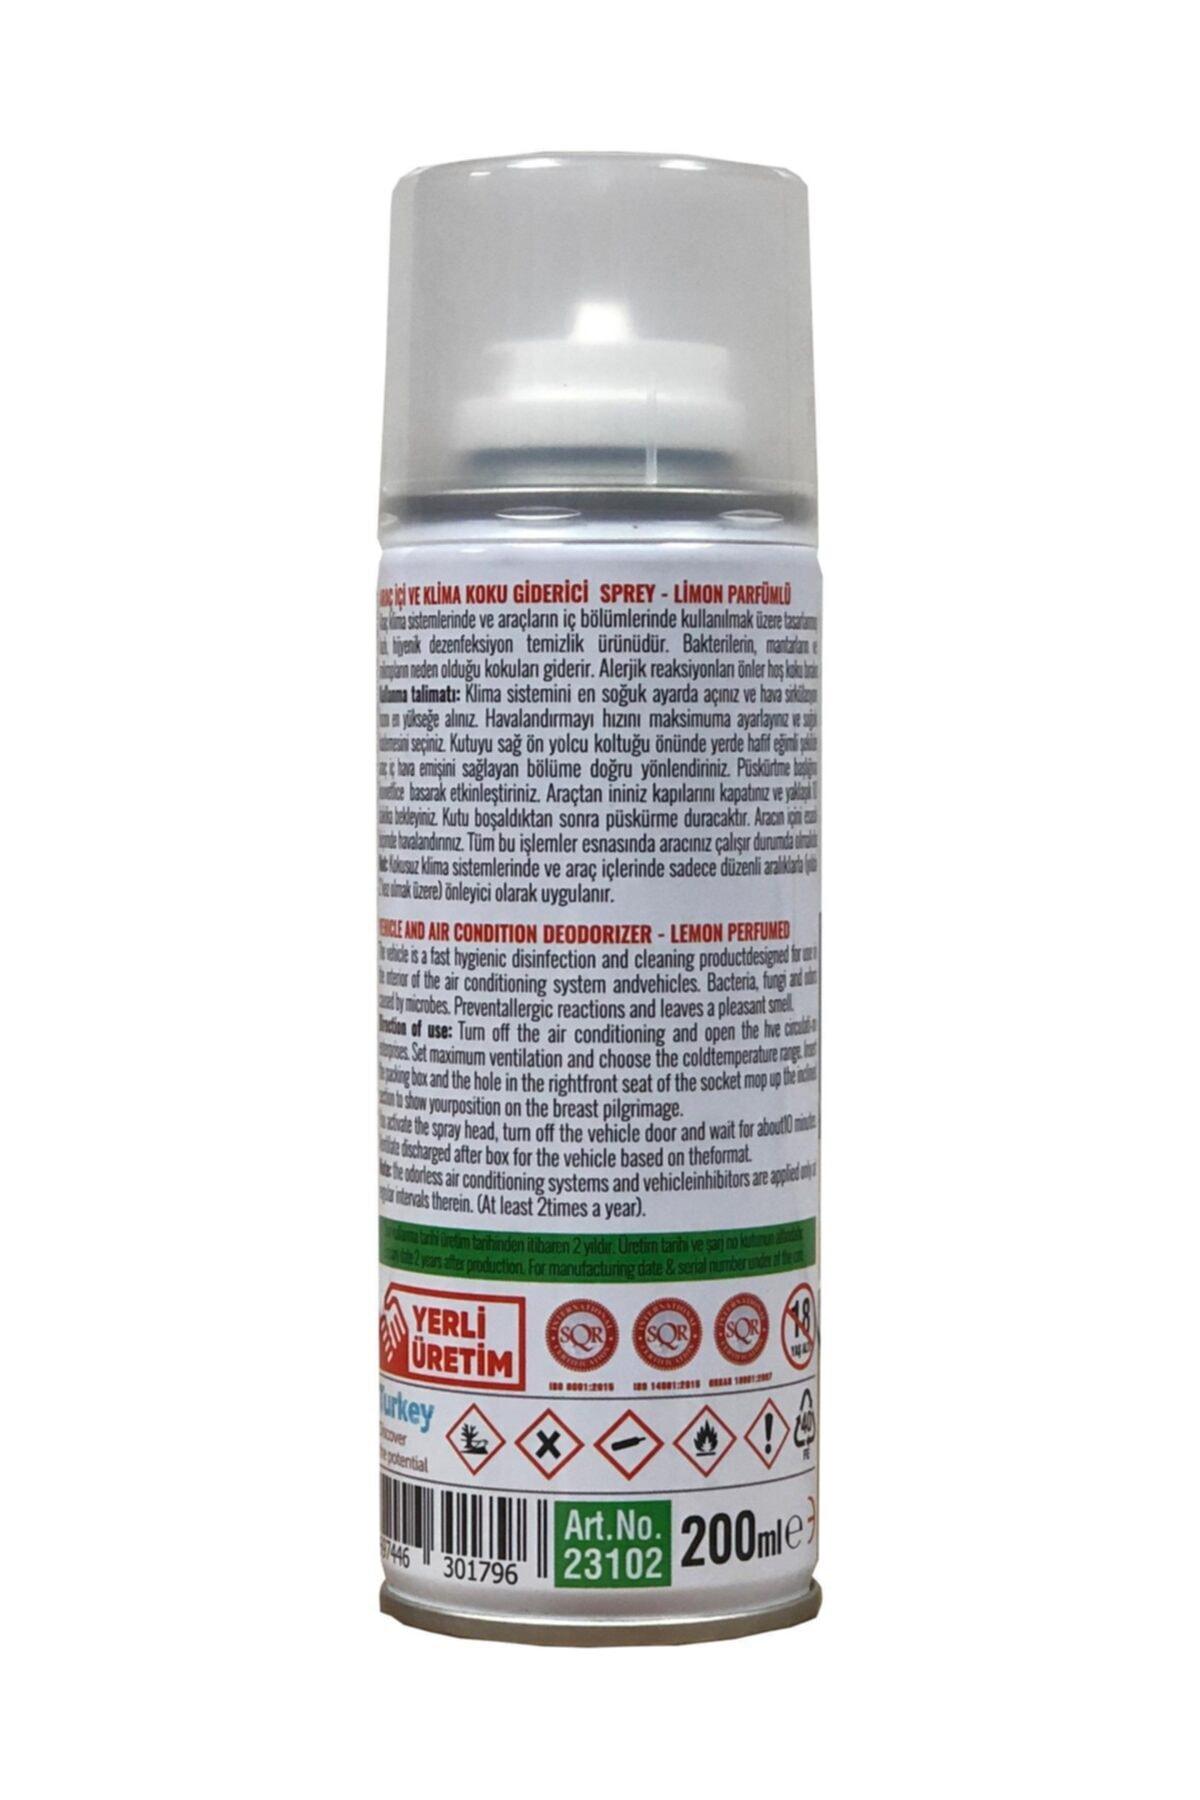 MxS Araç Içi Oto Klima Koku Giderici Fresh Bomba Limon 200 ml 2